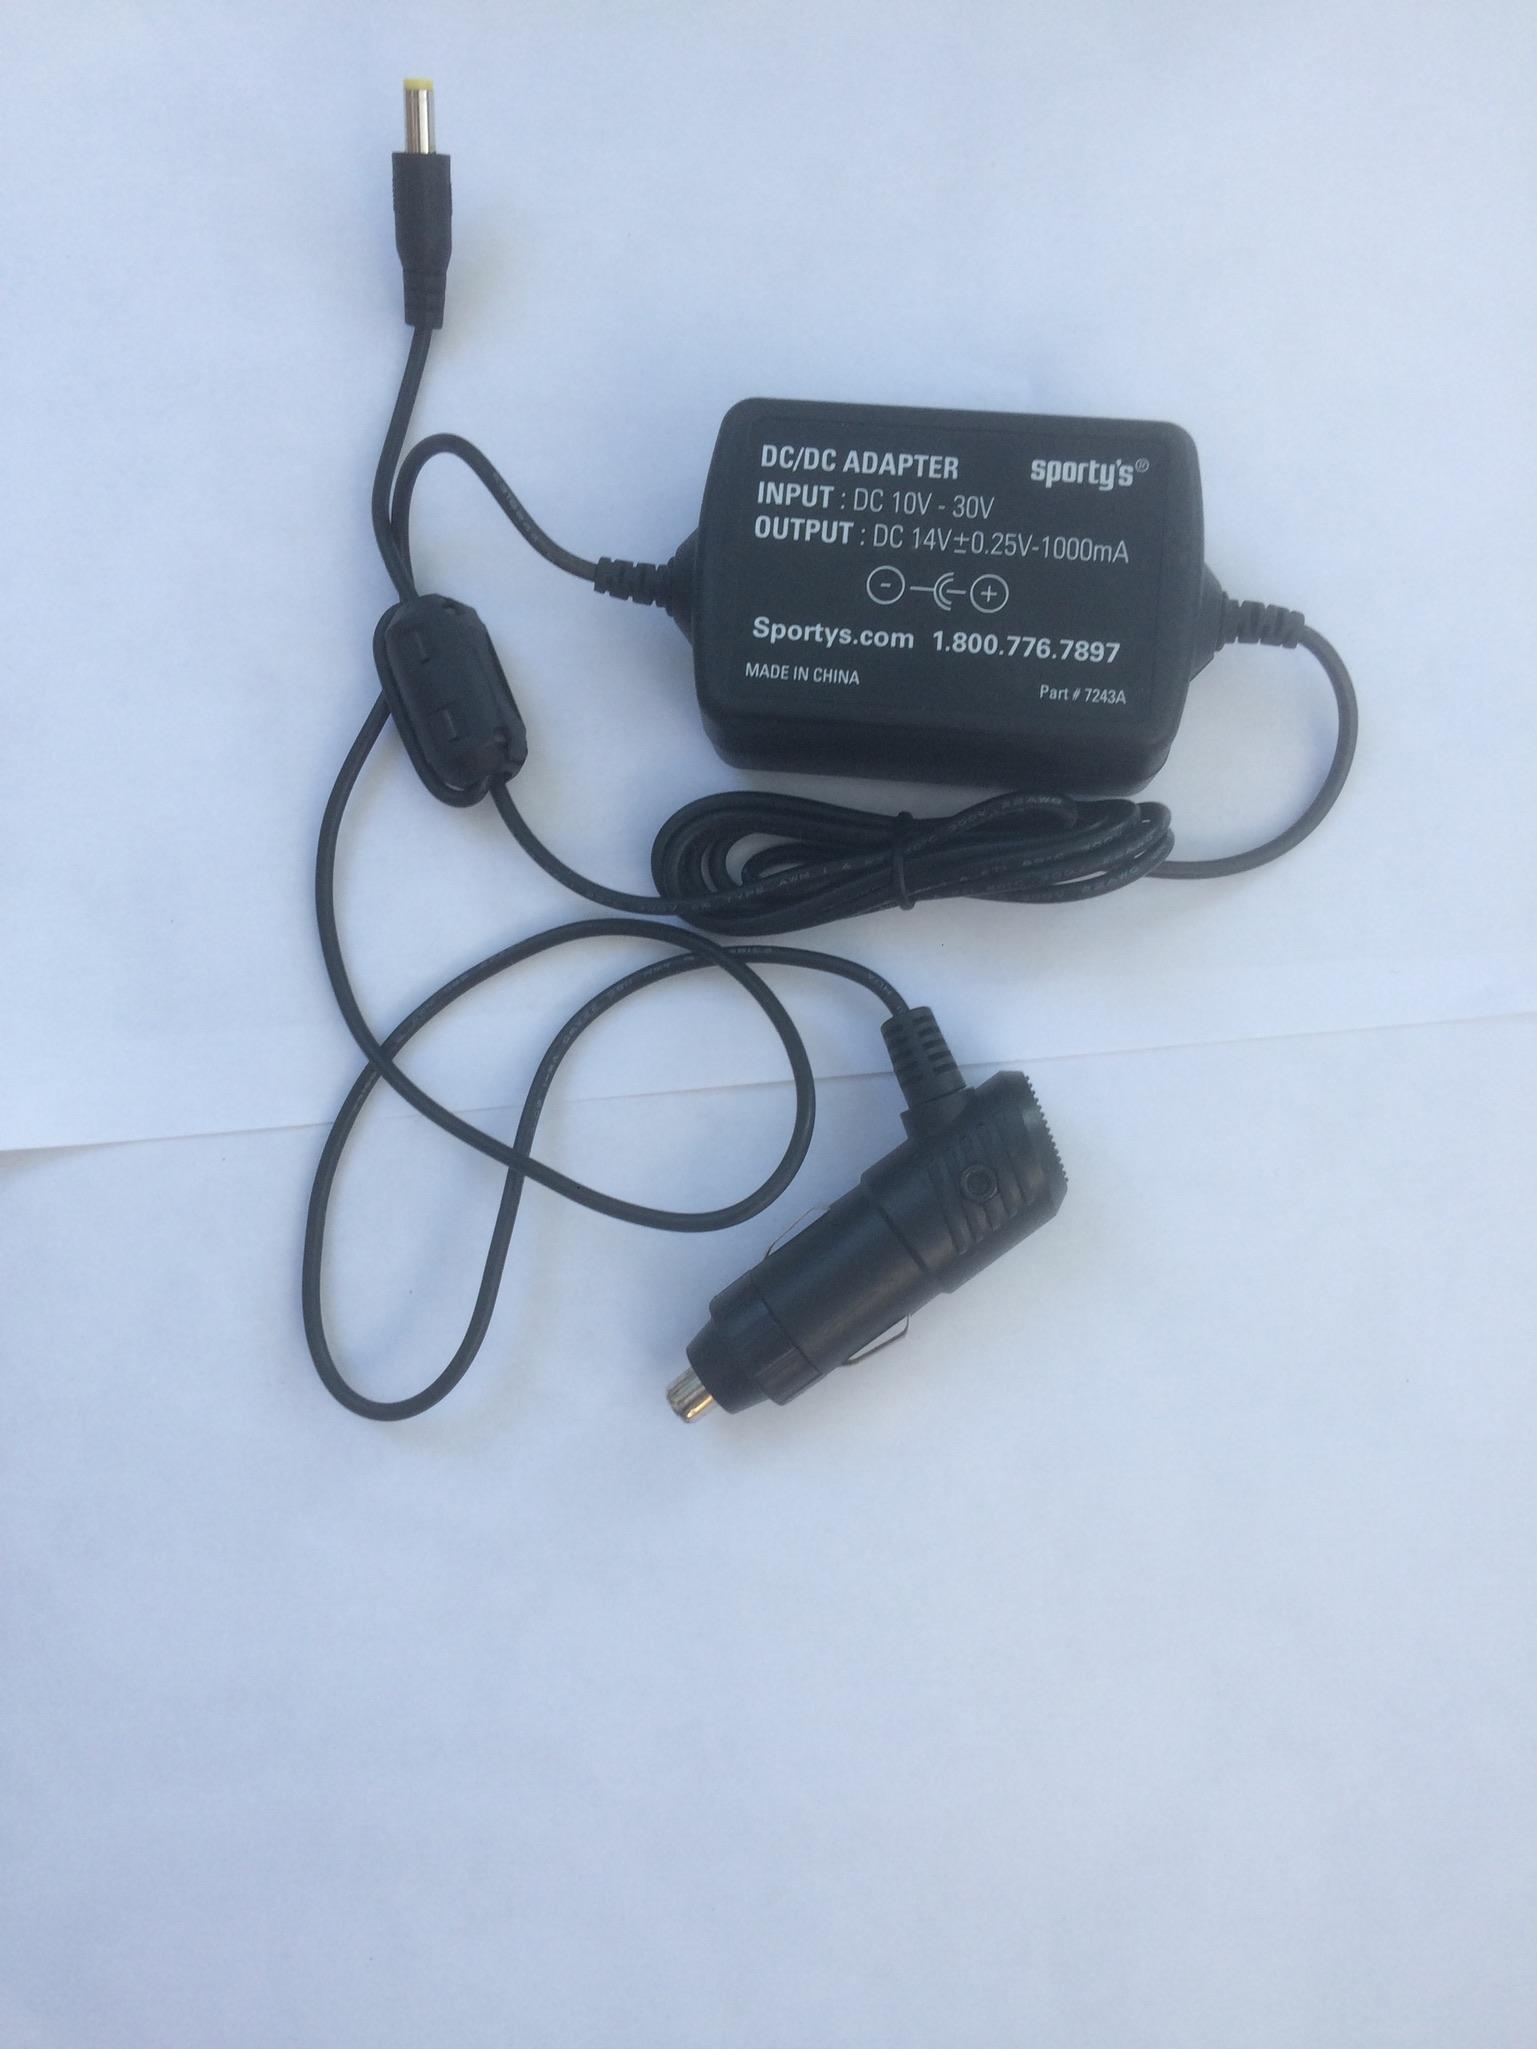 Sporty's SP200 Handheld Aviation Transceiver   afors advert